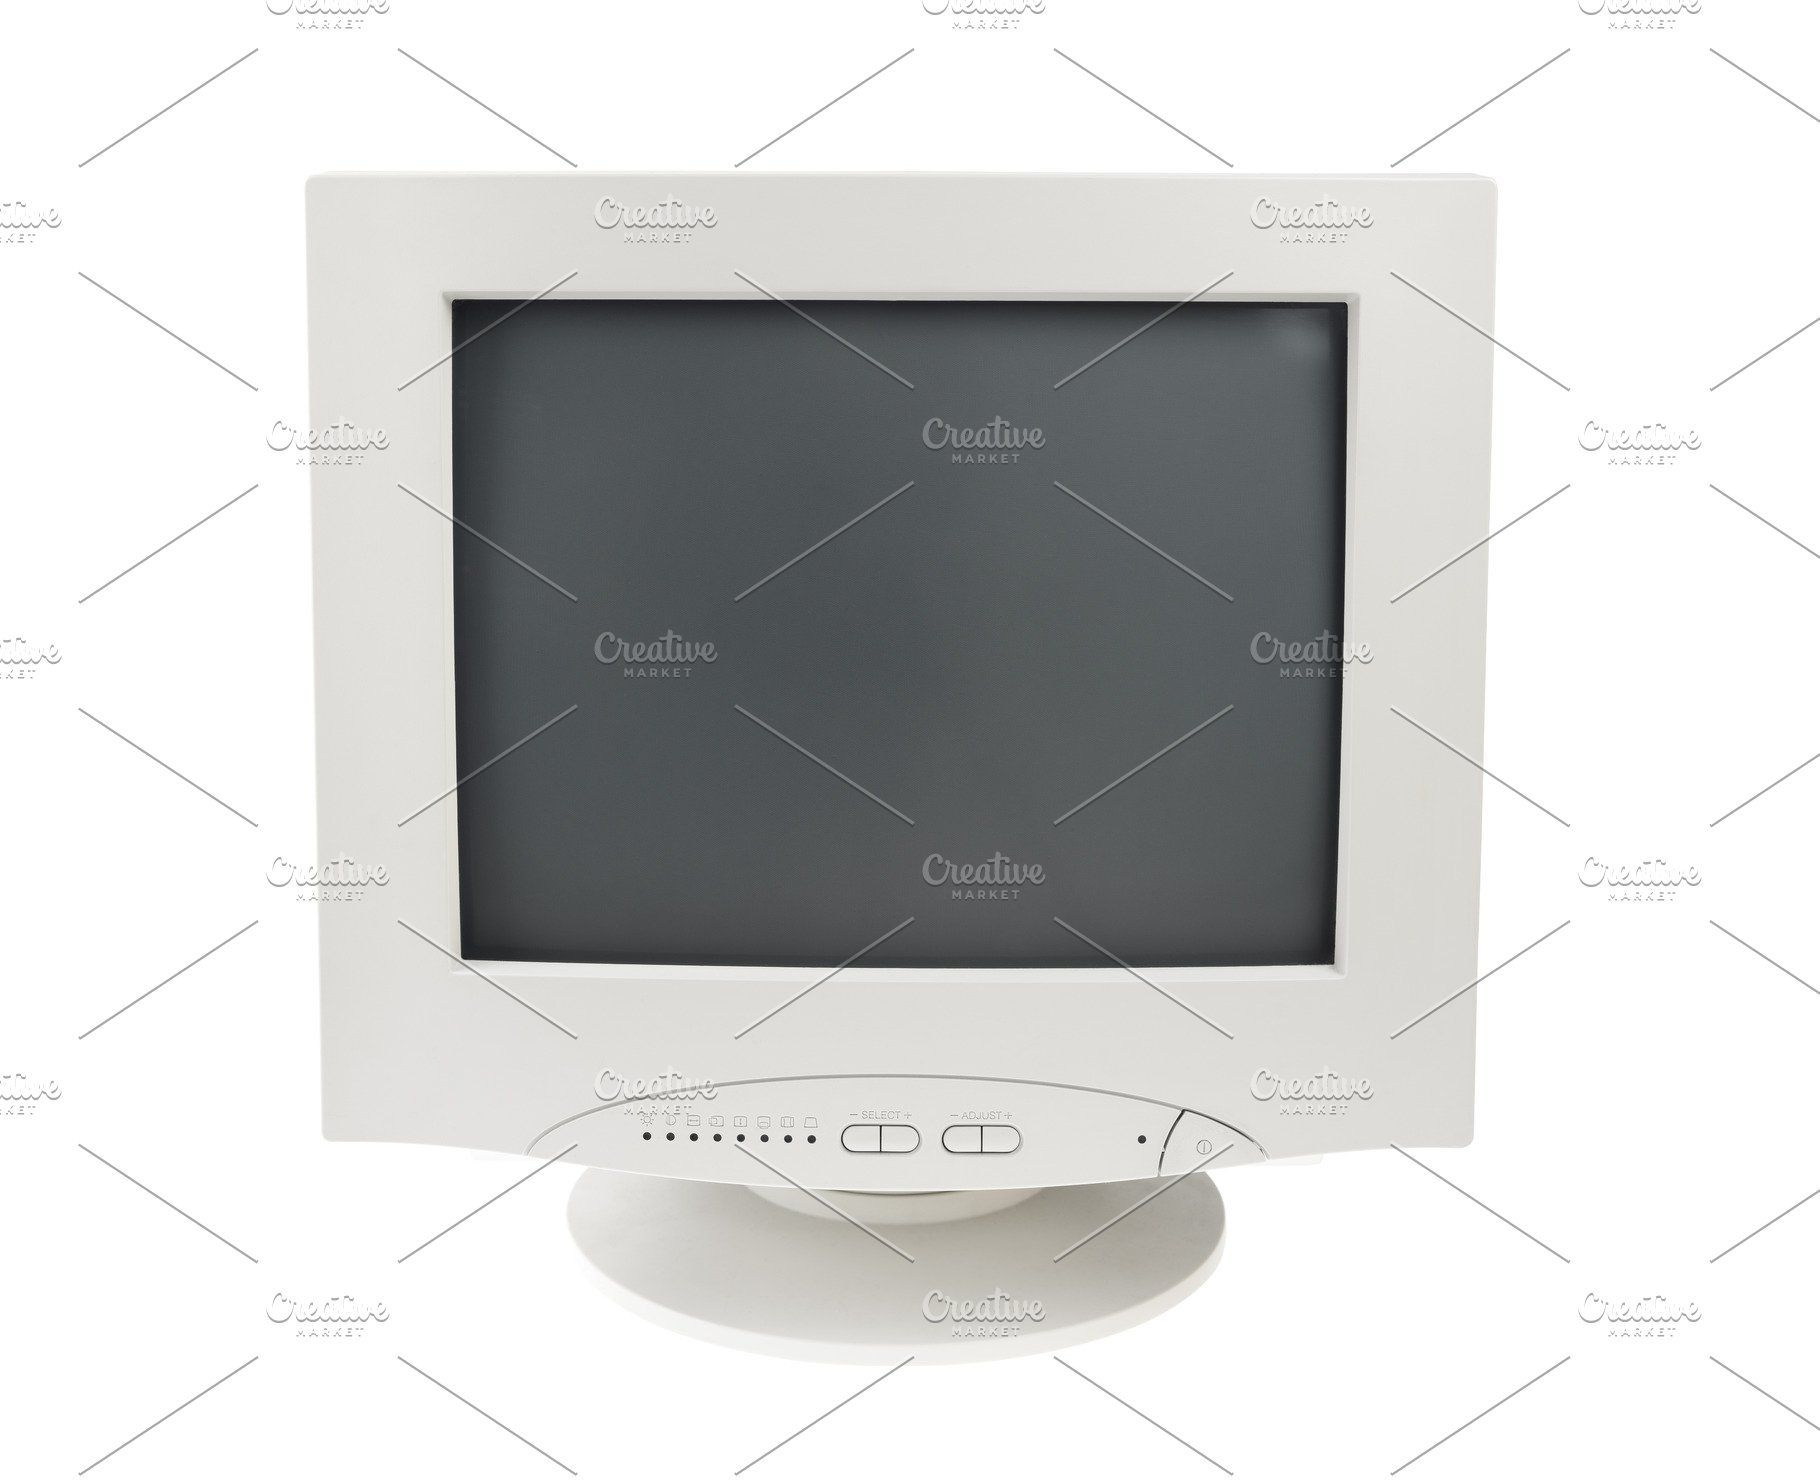 Old Crt Monitor Screen Display   Technology photos, Monitor, Display